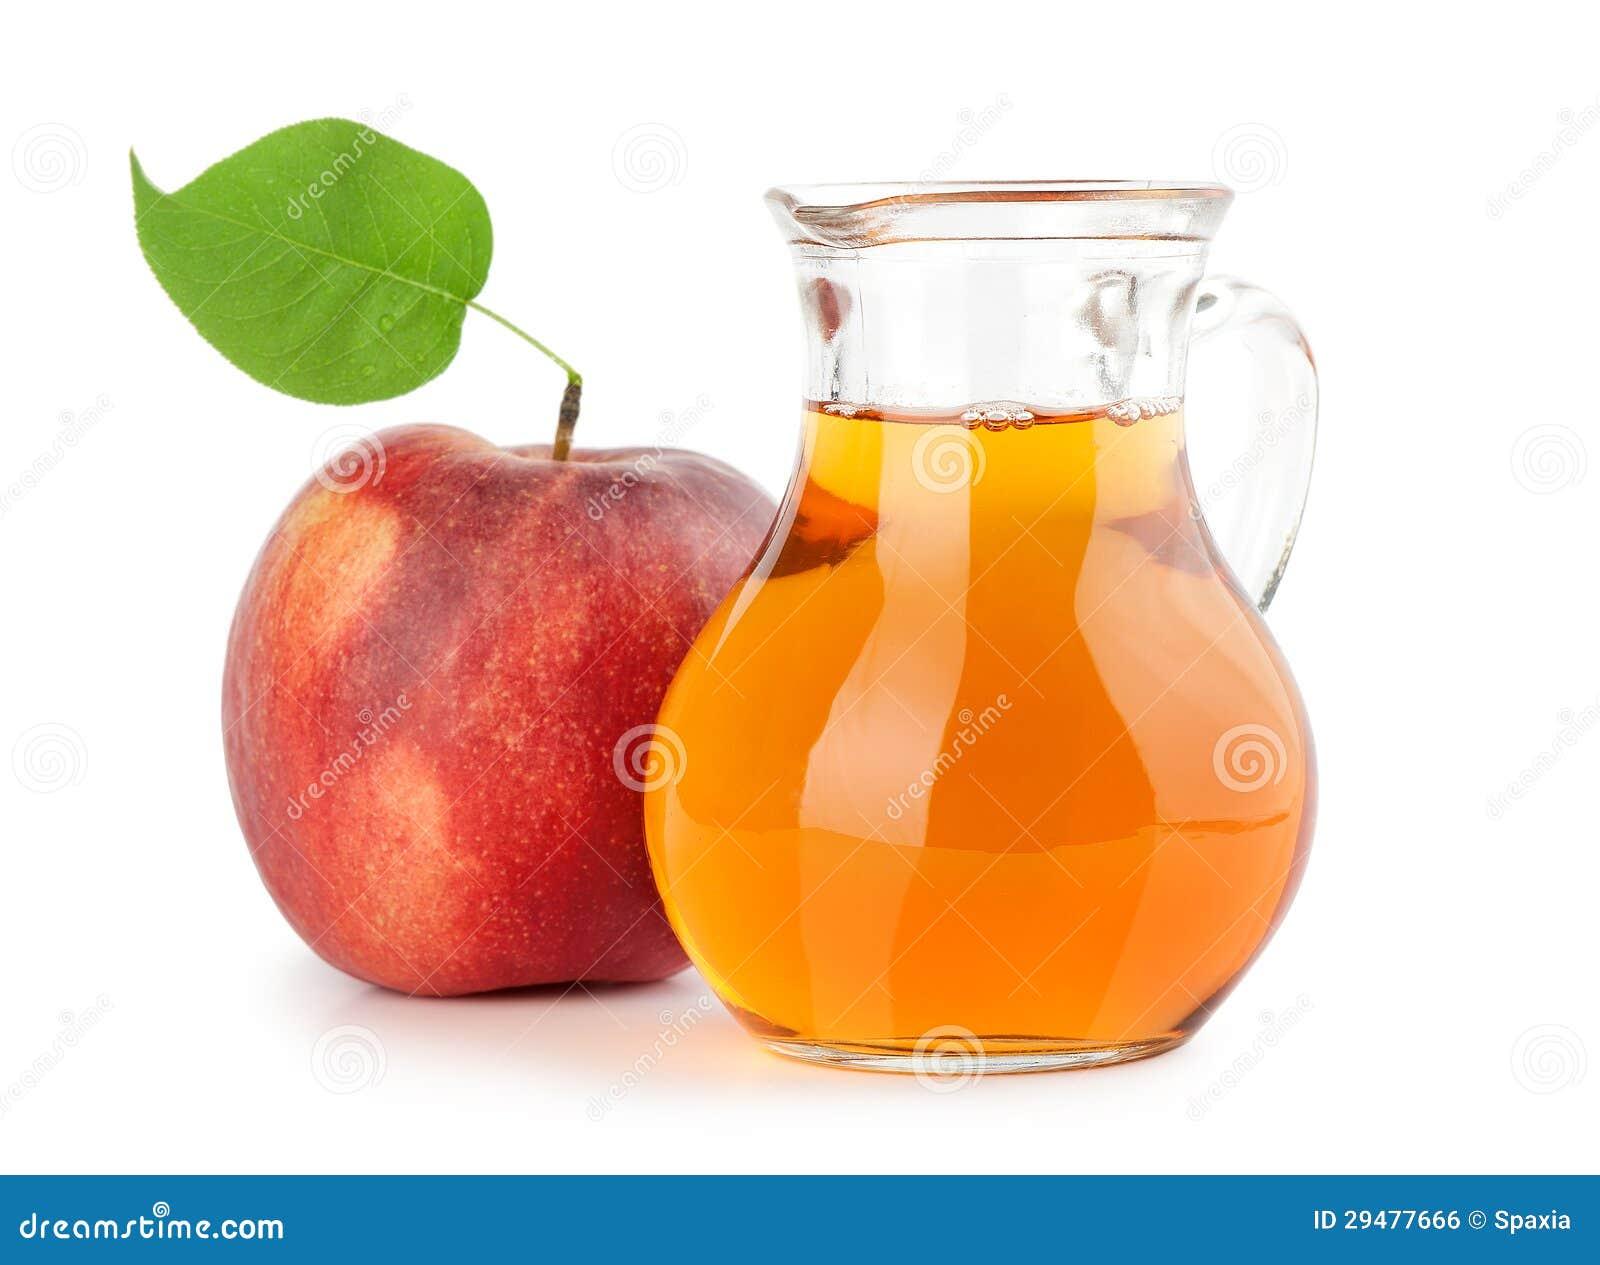 Jug Of Apple Juice Royalty Free Stock Image - Image: 29477666